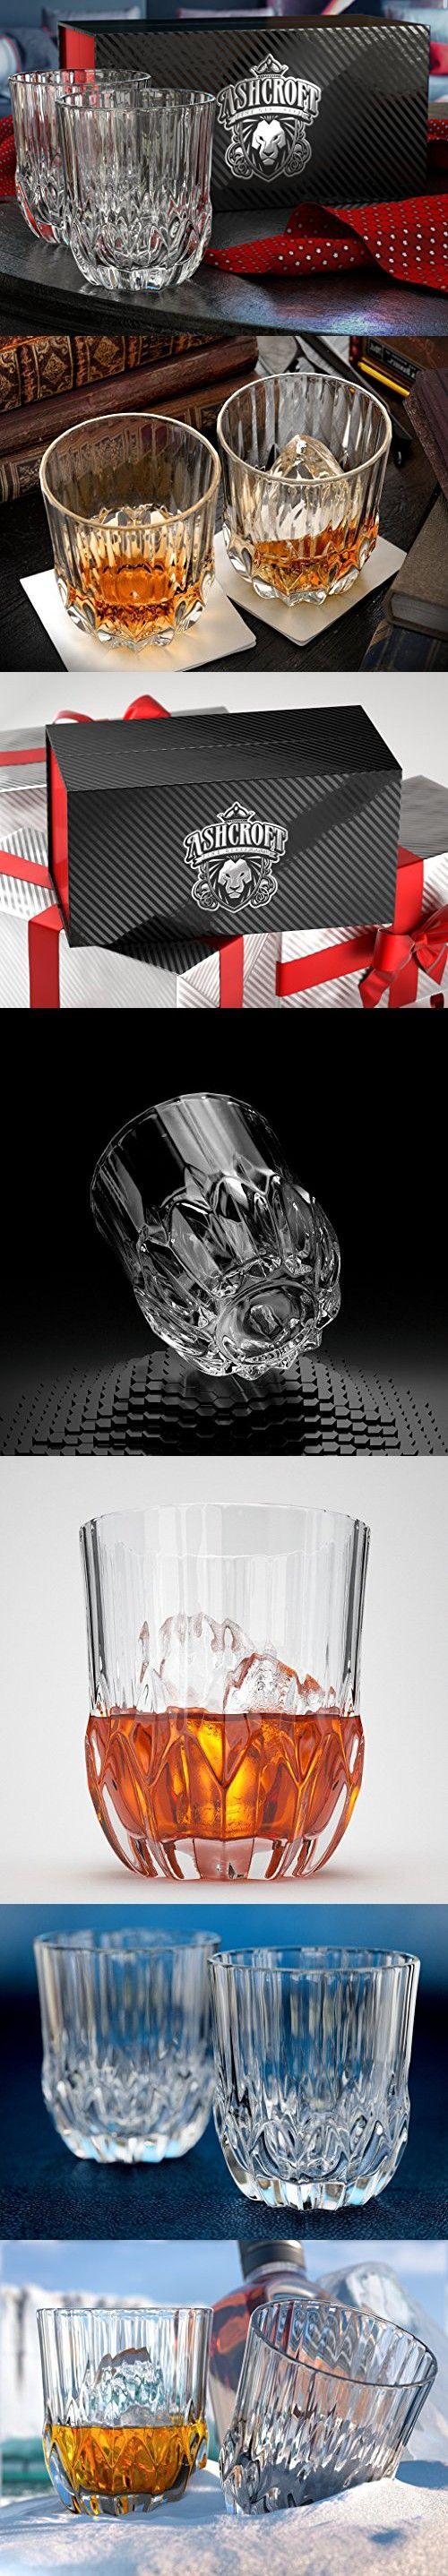 Glacier Whiskey Glasses, Scotch Glasses By Ashcroft - Set Of 2. Unique, Elegant, Dishwasher Safe, Glass Liquor and Bourbon Tumblers. Ultra-Clarity Glassware.